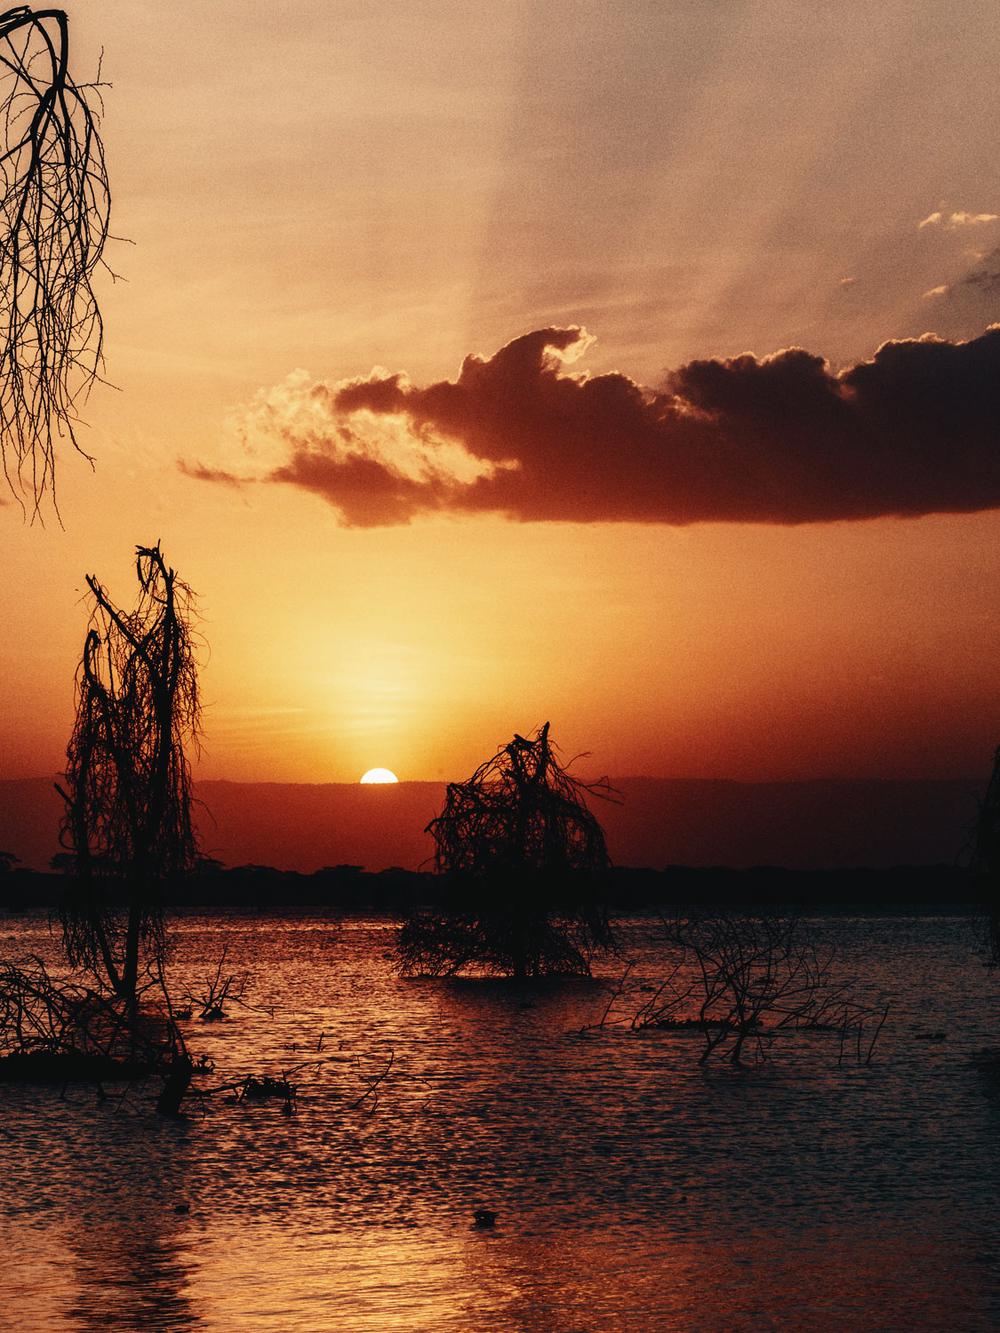 CallieGiovanna_Africa_Kenya_LakeNaivasha_20150101_08749.jpg